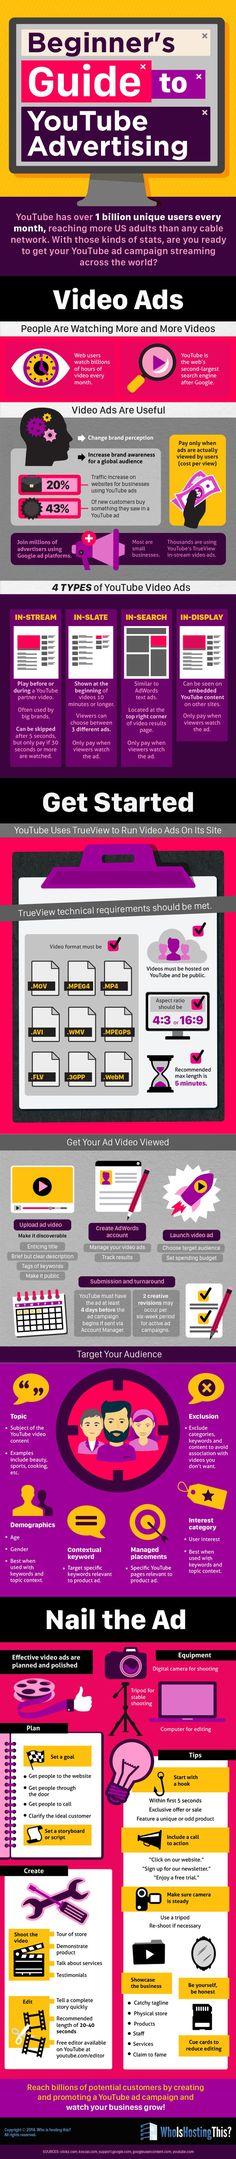 The Beginner's Guide to #YouTube Advertising - #infographic #socialmedia